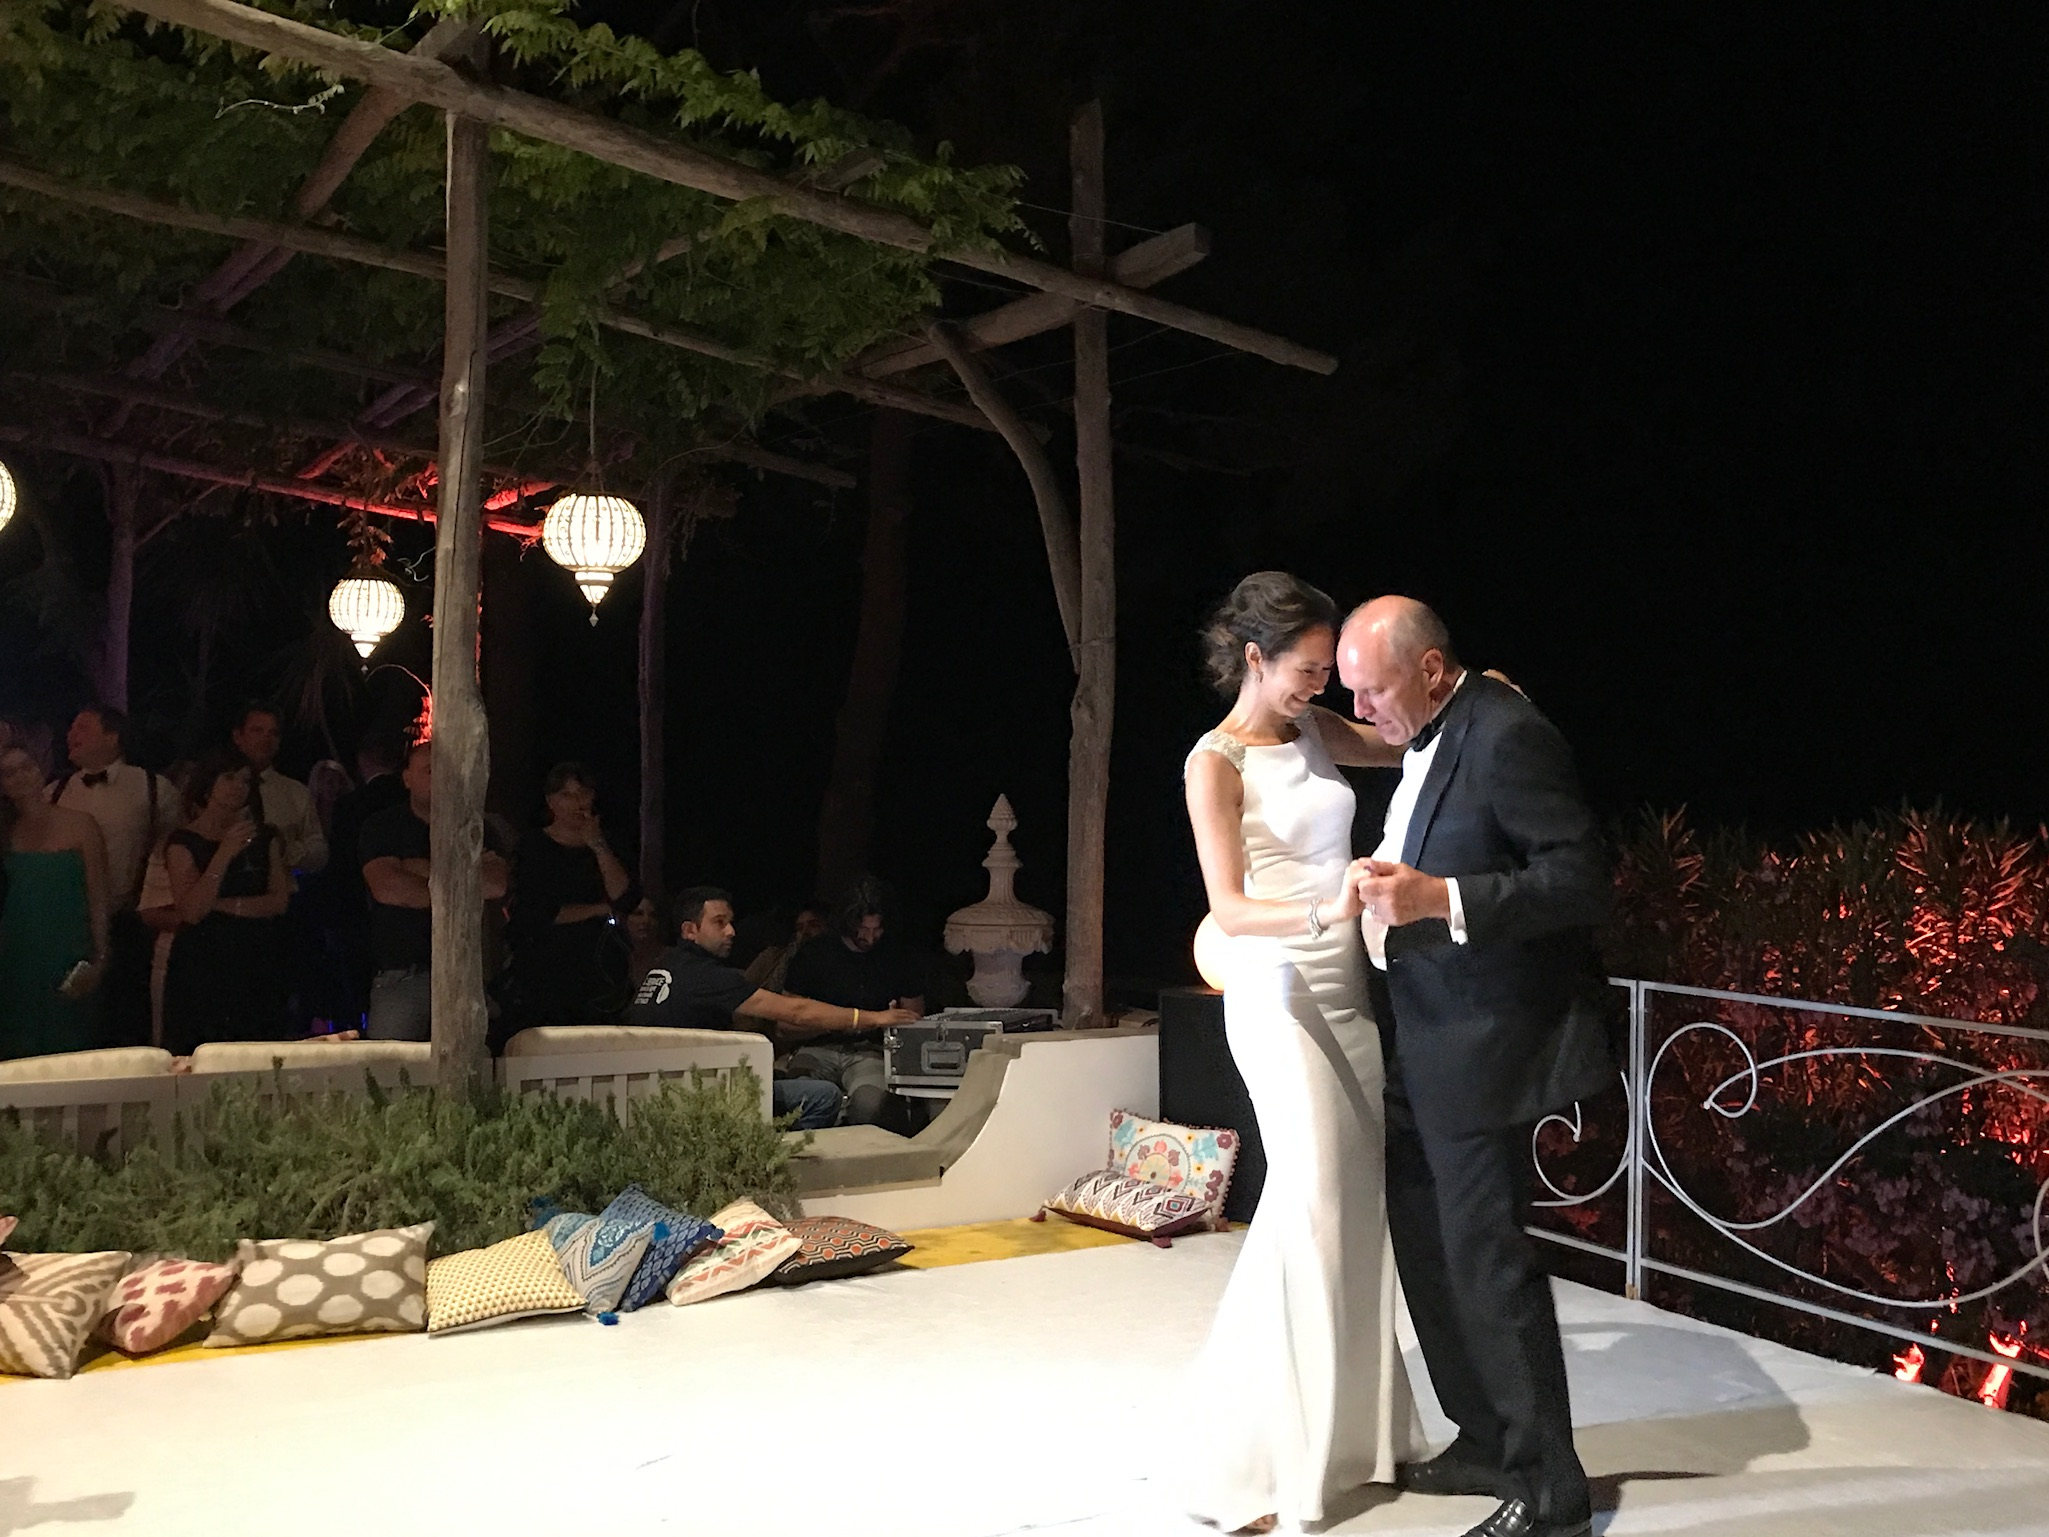 https://www.weddingamalfi.com/wp-content/uploads/Nathalie-and-Benjamin-wedding-in-Positano-26.jpg